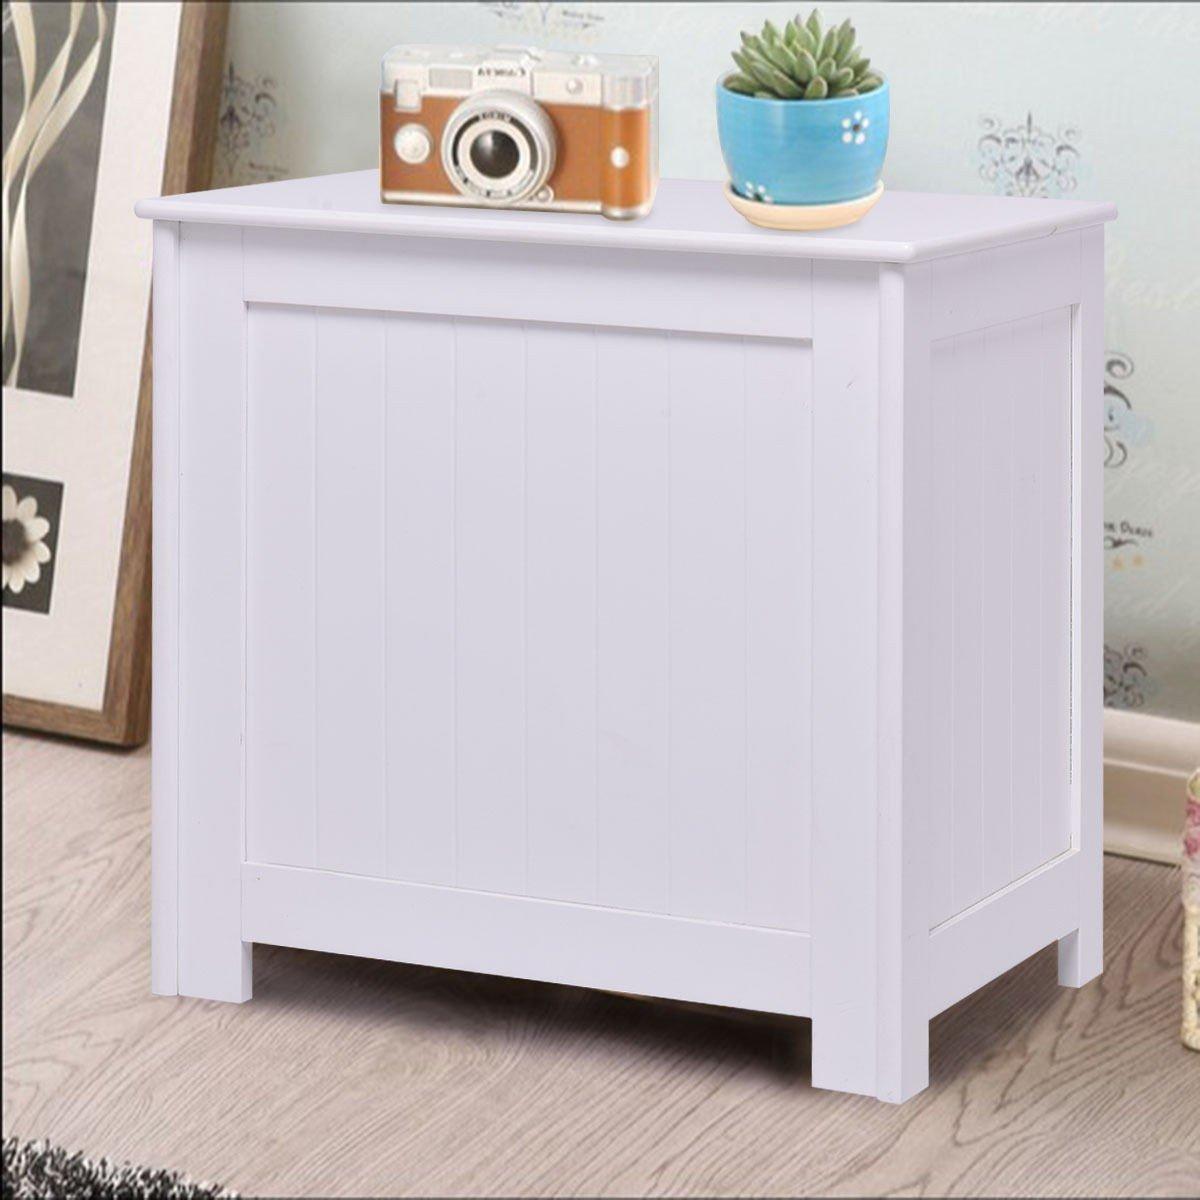 White Wood Laundry Hamper Clothes Storage Basket